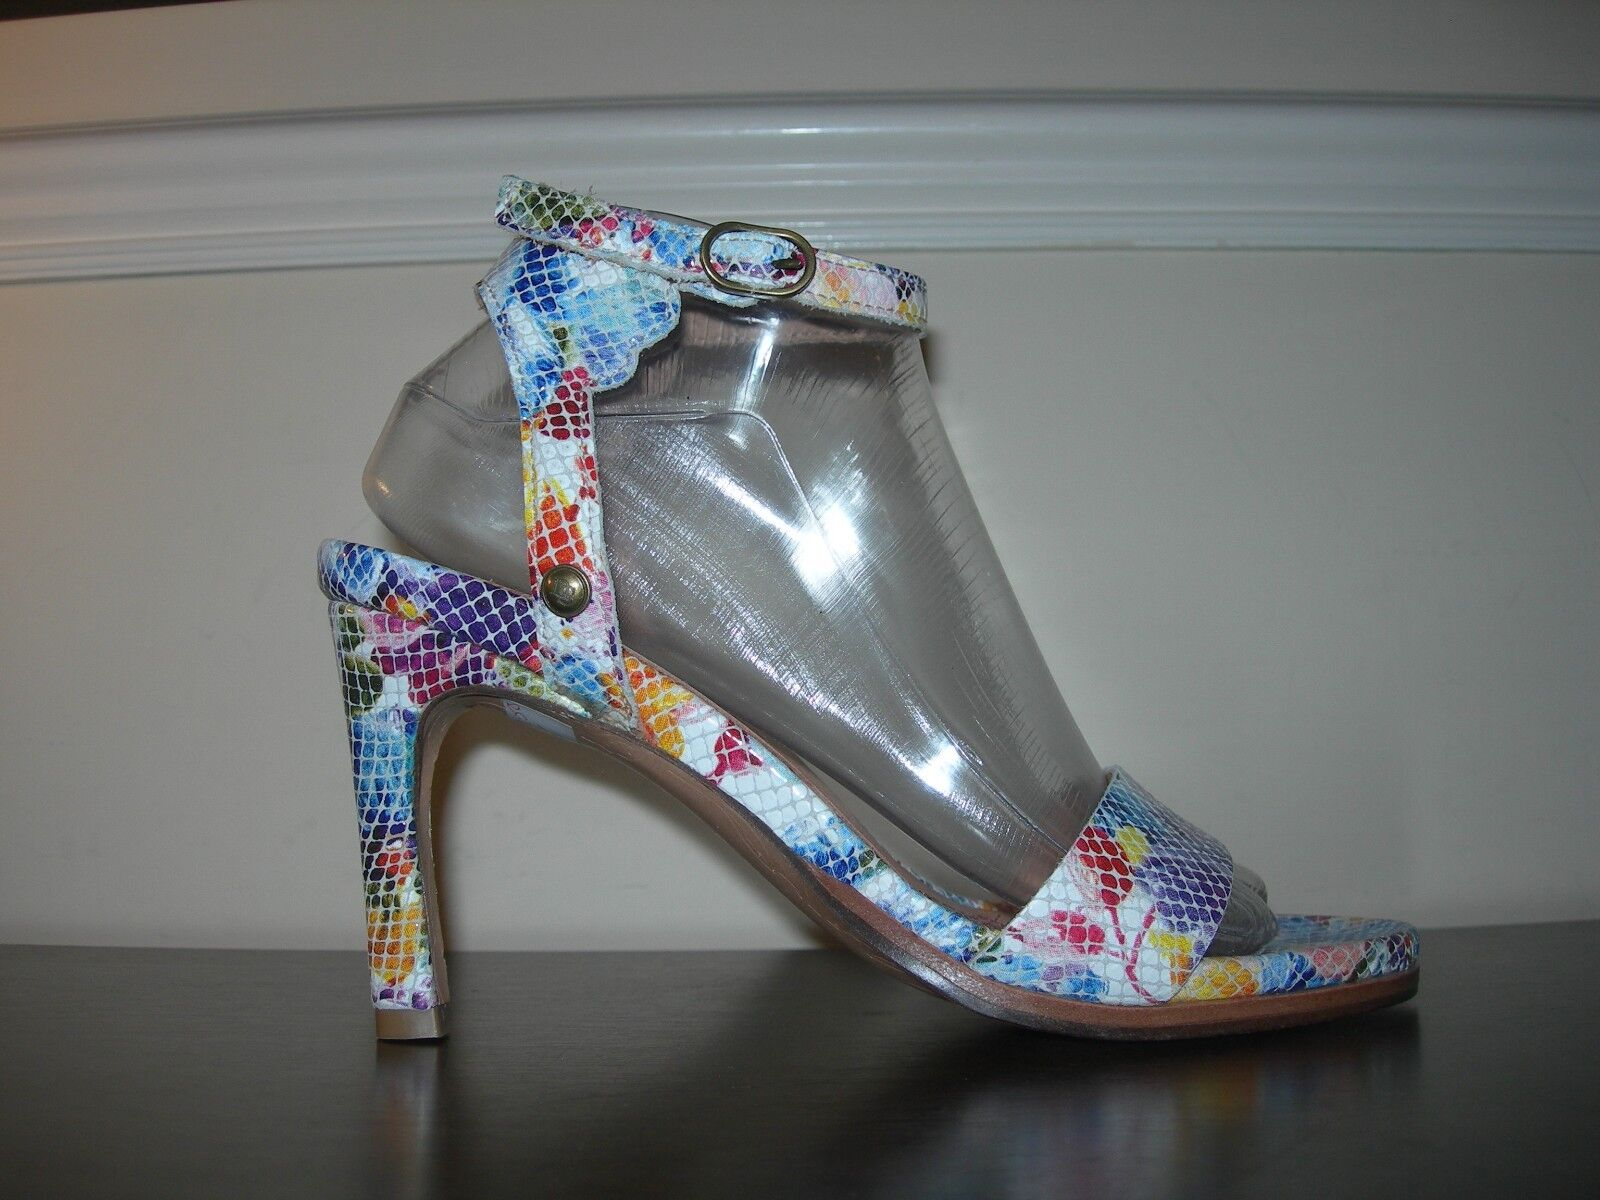 NEOSENS Donna sandali tacchi alti con cinturini EU in pelle 100% floreale EU cinturini 39/ e85339